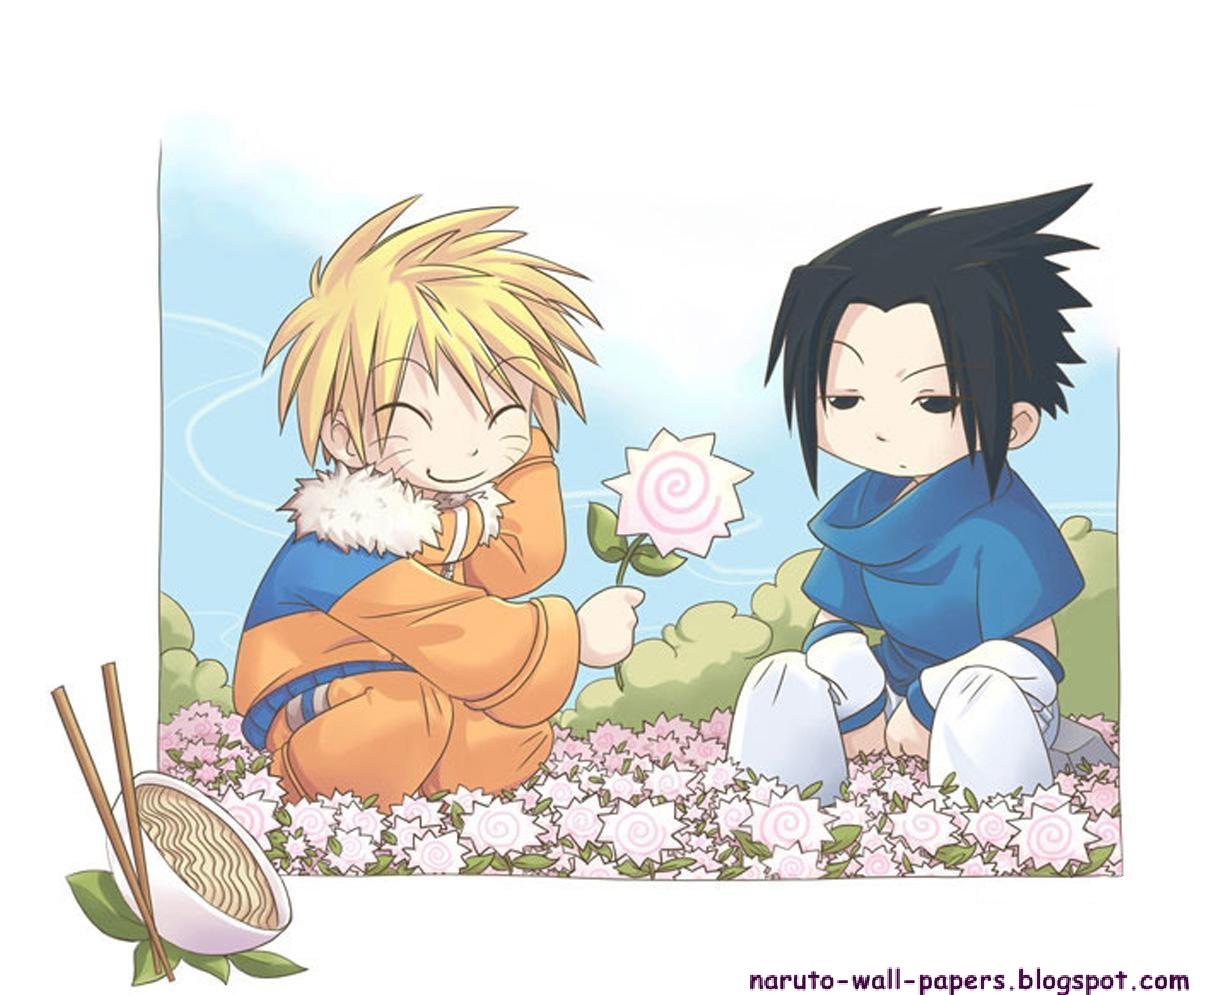 Naruto And Bleach Anime Wallpapers Cute Team Kakashi Chibi Naruto Pix 1205x995